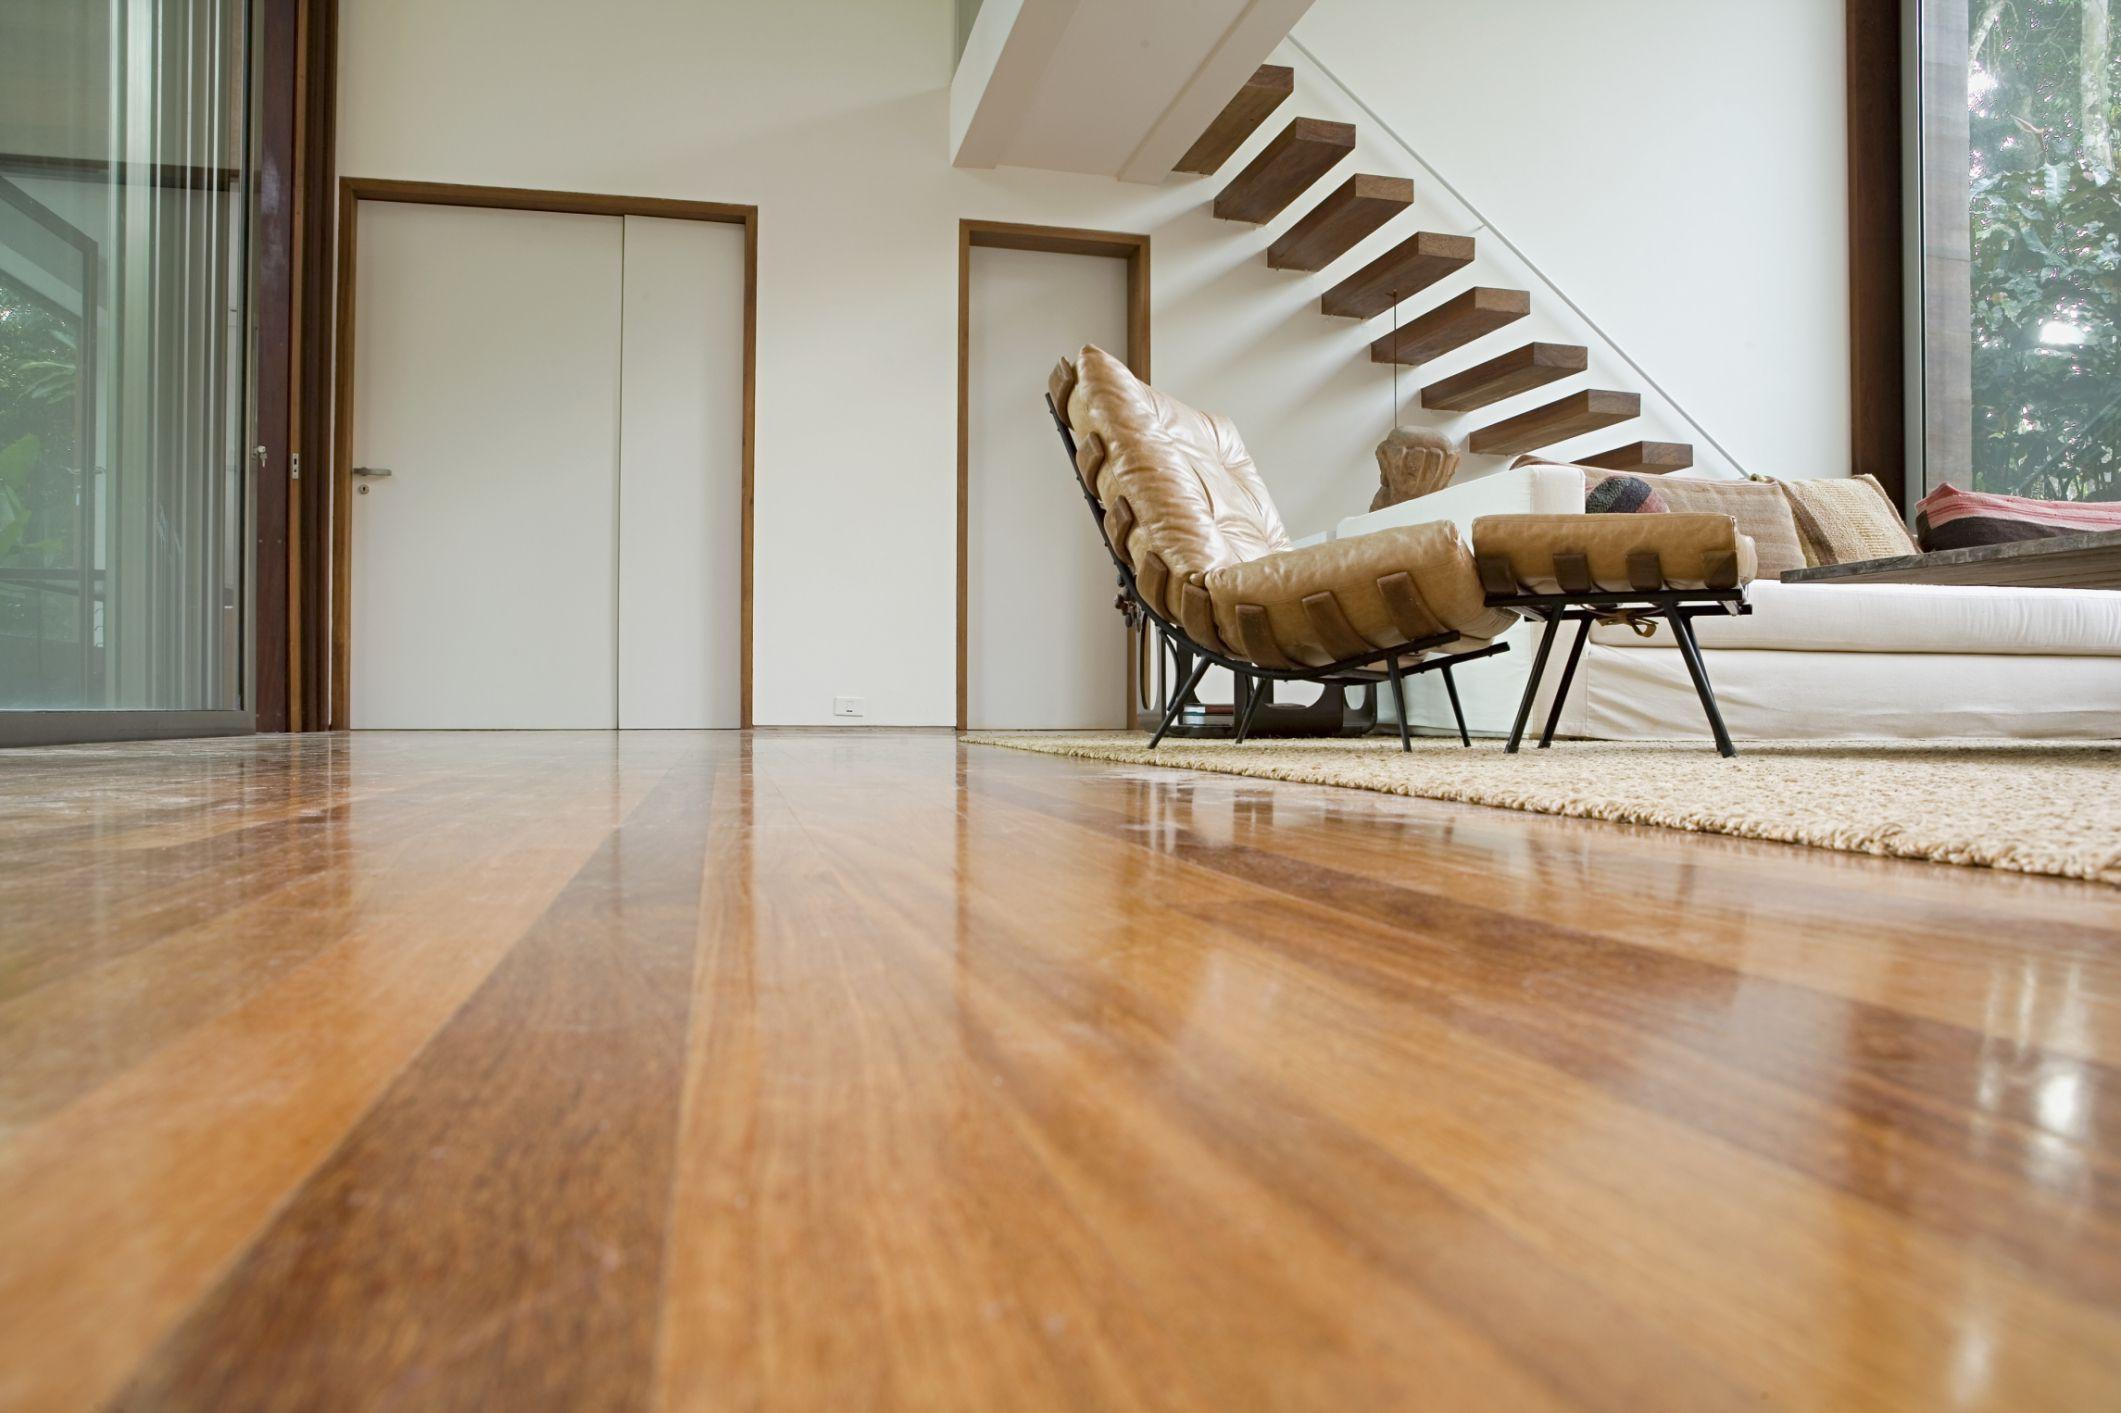 engineered hardwood flooring cost estimator of engineered wood flooring vs solid wood flooring in 200571260 001 highres 56a49dec5f9b58b7d0d7dc1e